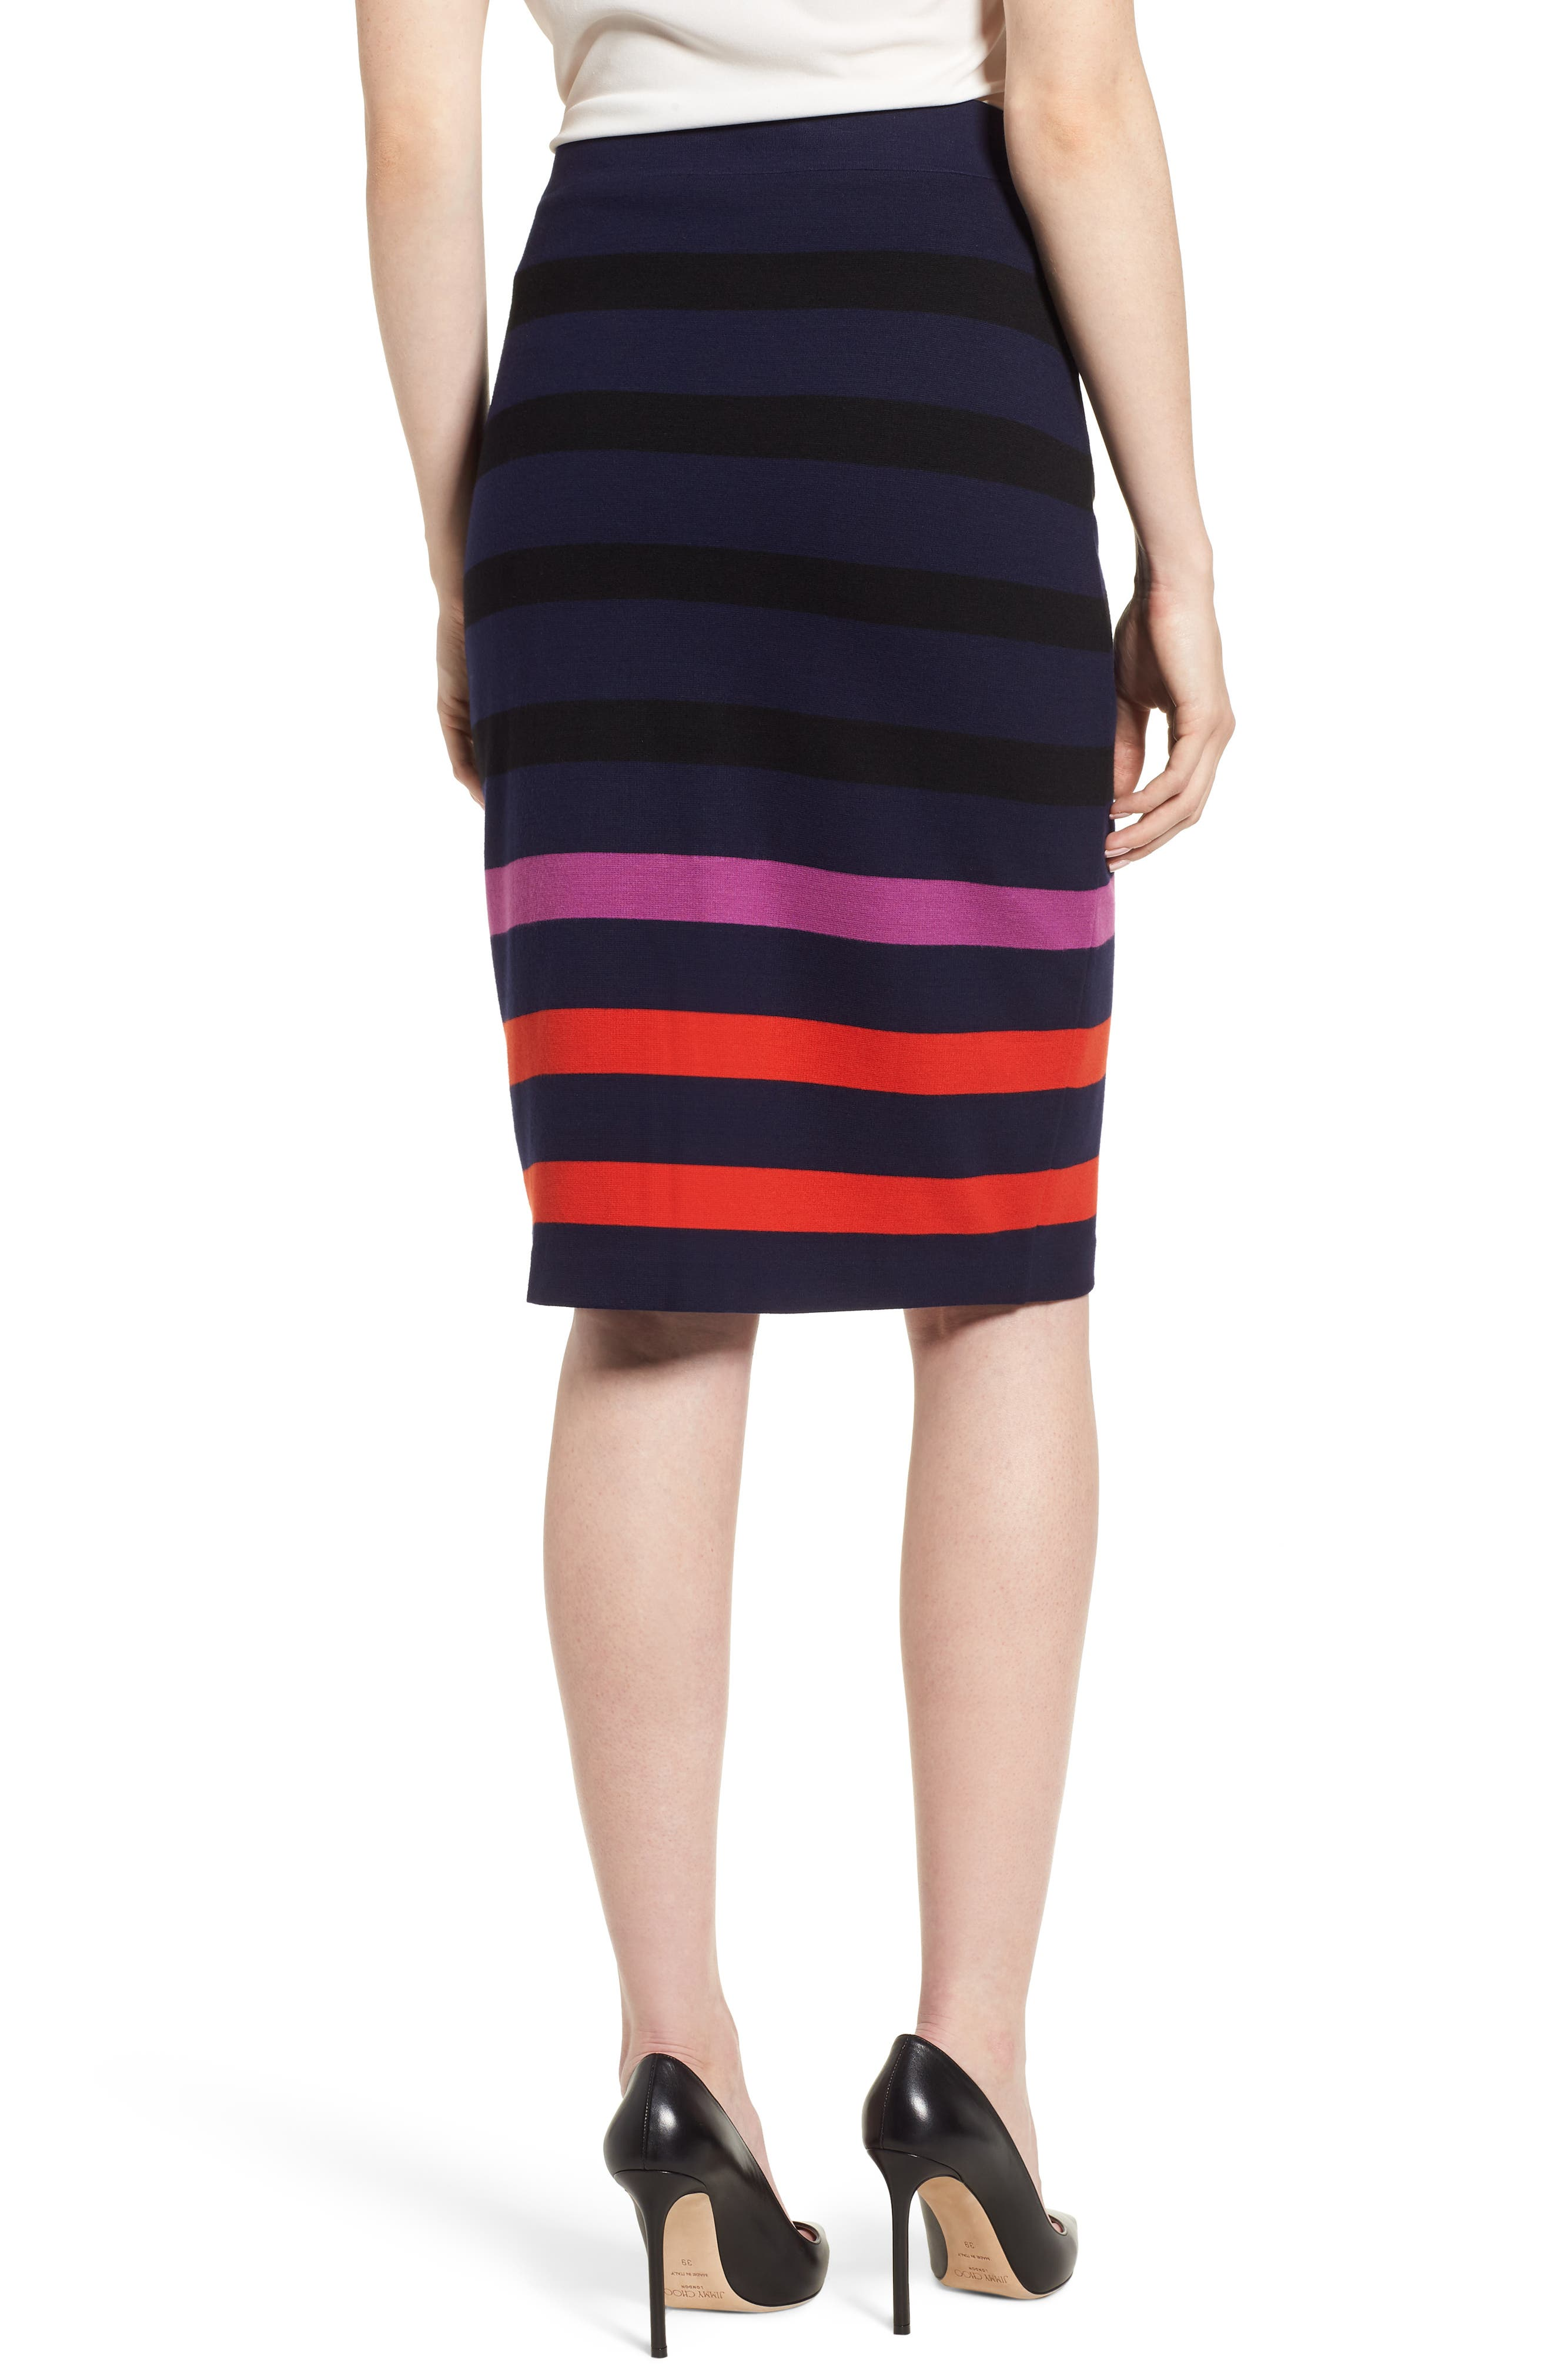 Ebienne Stripe Pencil Skirt,                             Alternate thumbnail 2, color,                             462